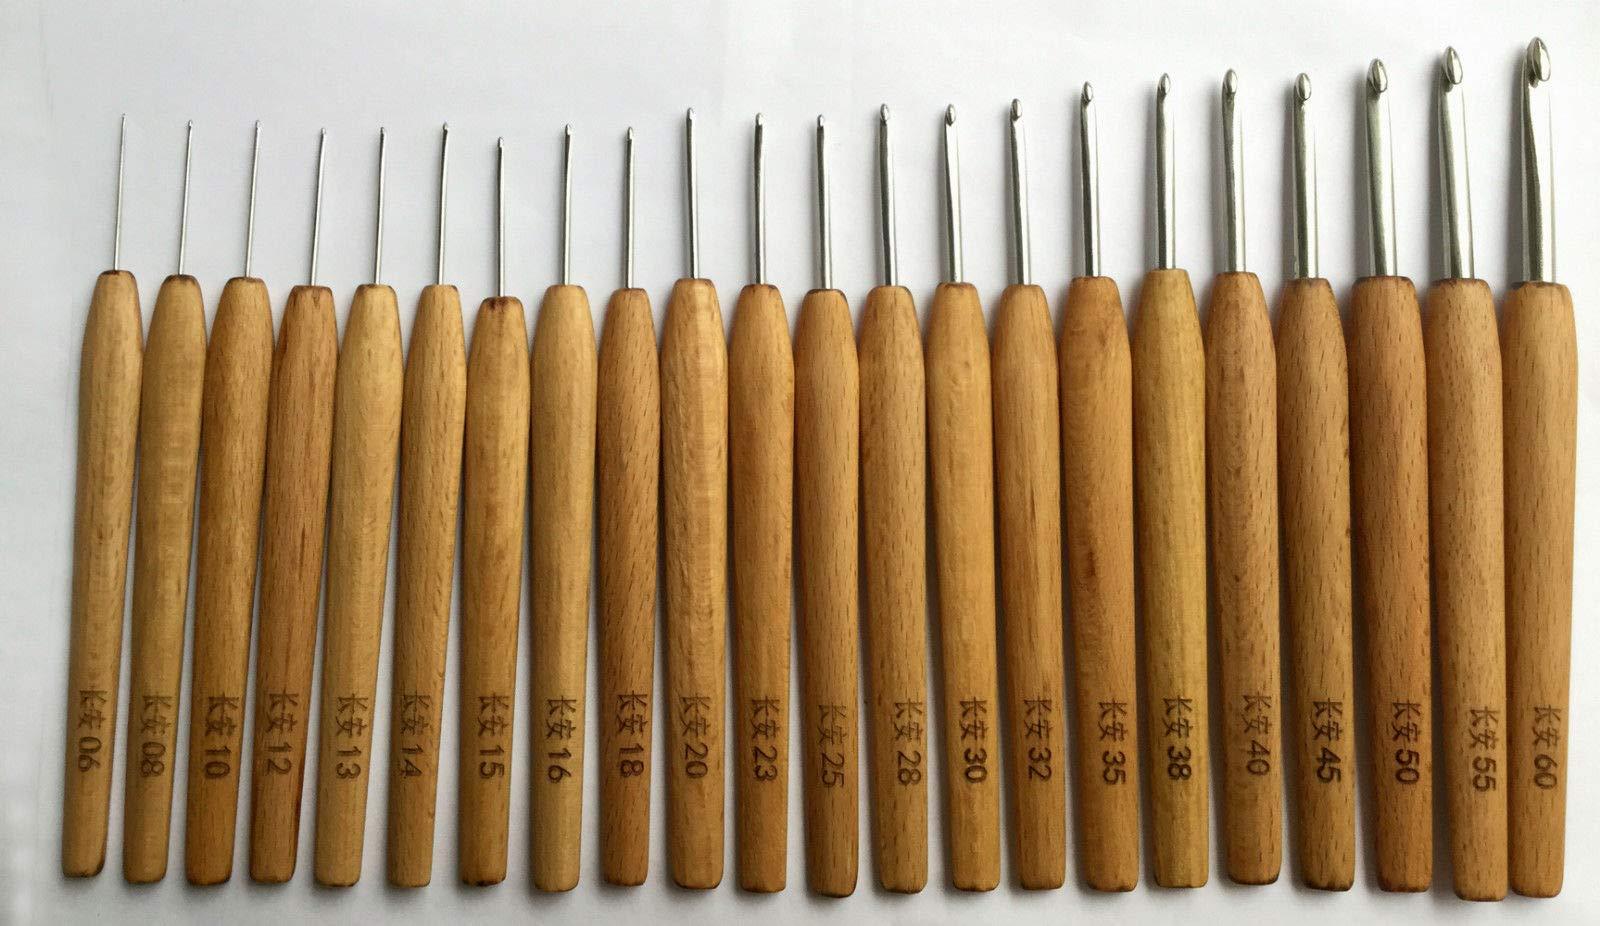 FidgetFidget Crochet Hooks Stainless Steel Wood Handle Redwood Knitting Needles Tool Kit 上海钩针 22 pcs Set by FidgetFidget (Image #2)